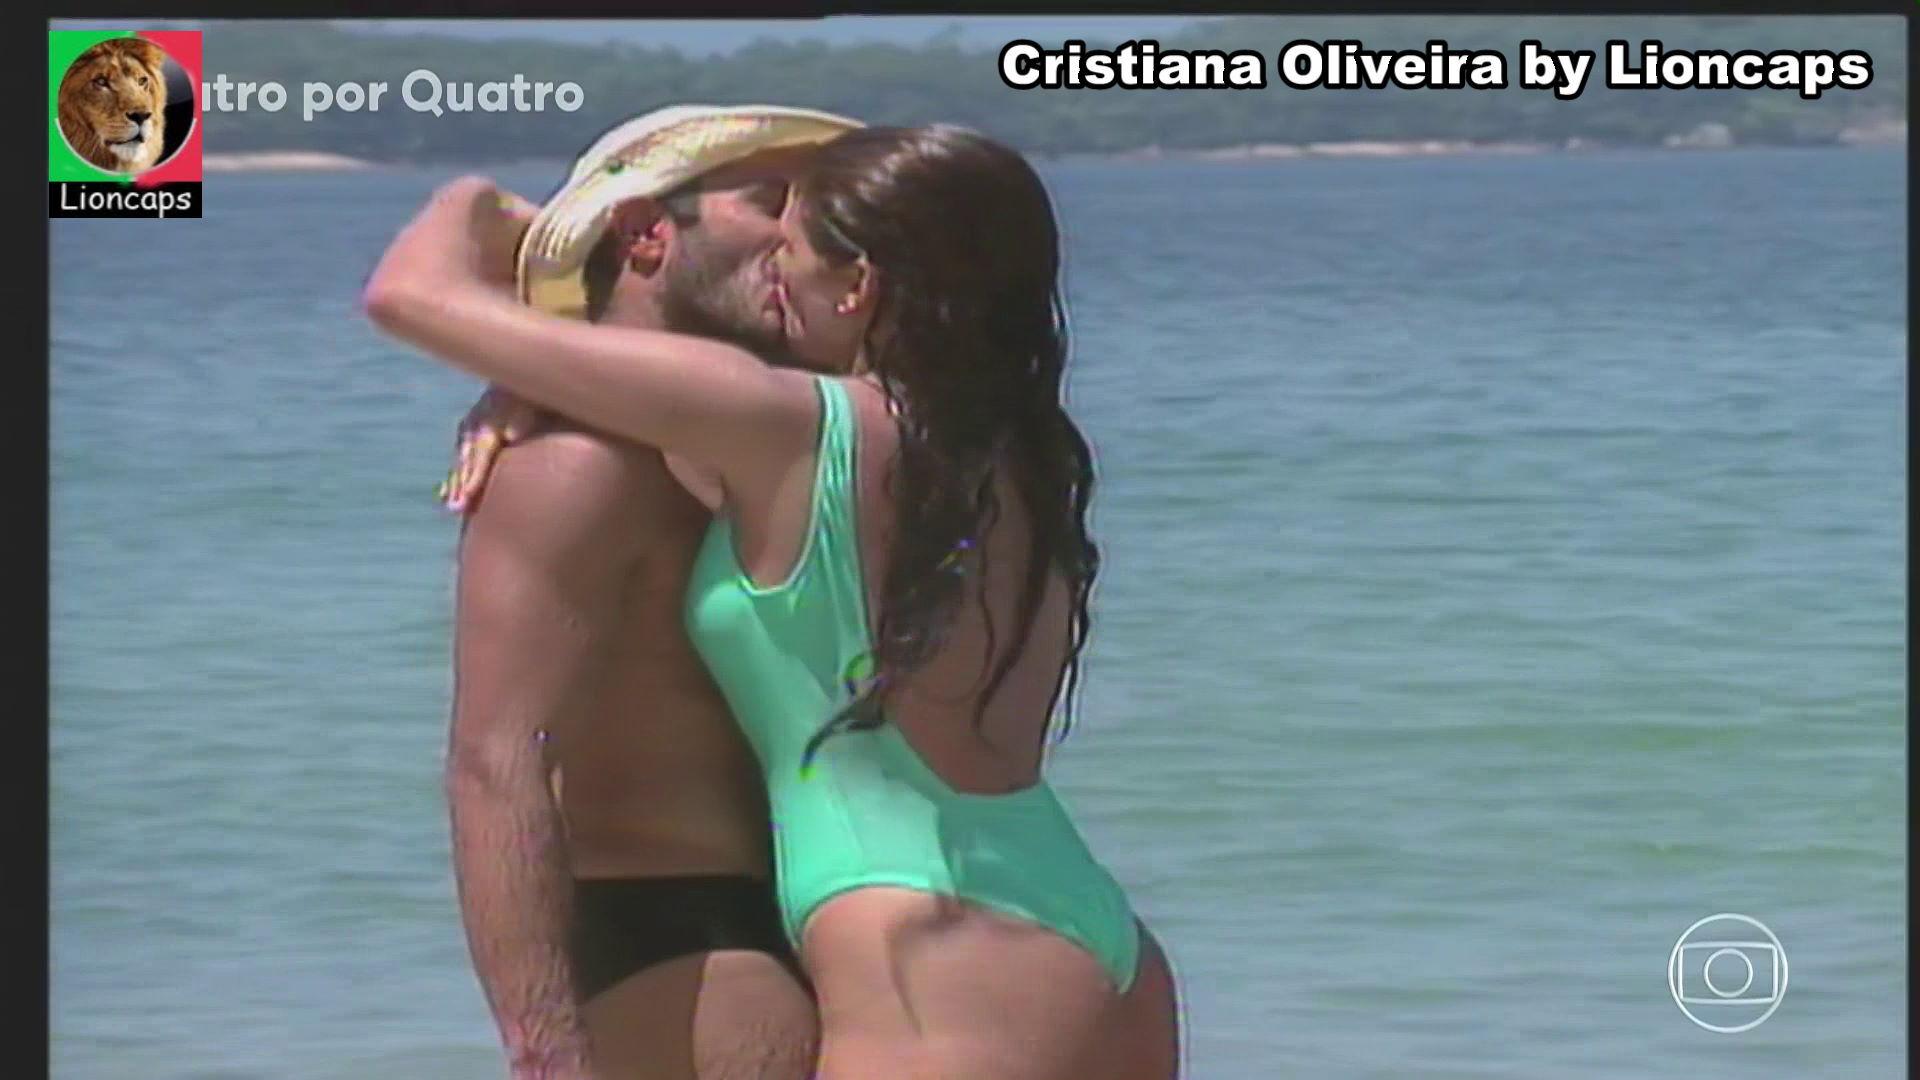 cristiana_oliveira_vs200604-088 (5).JPG